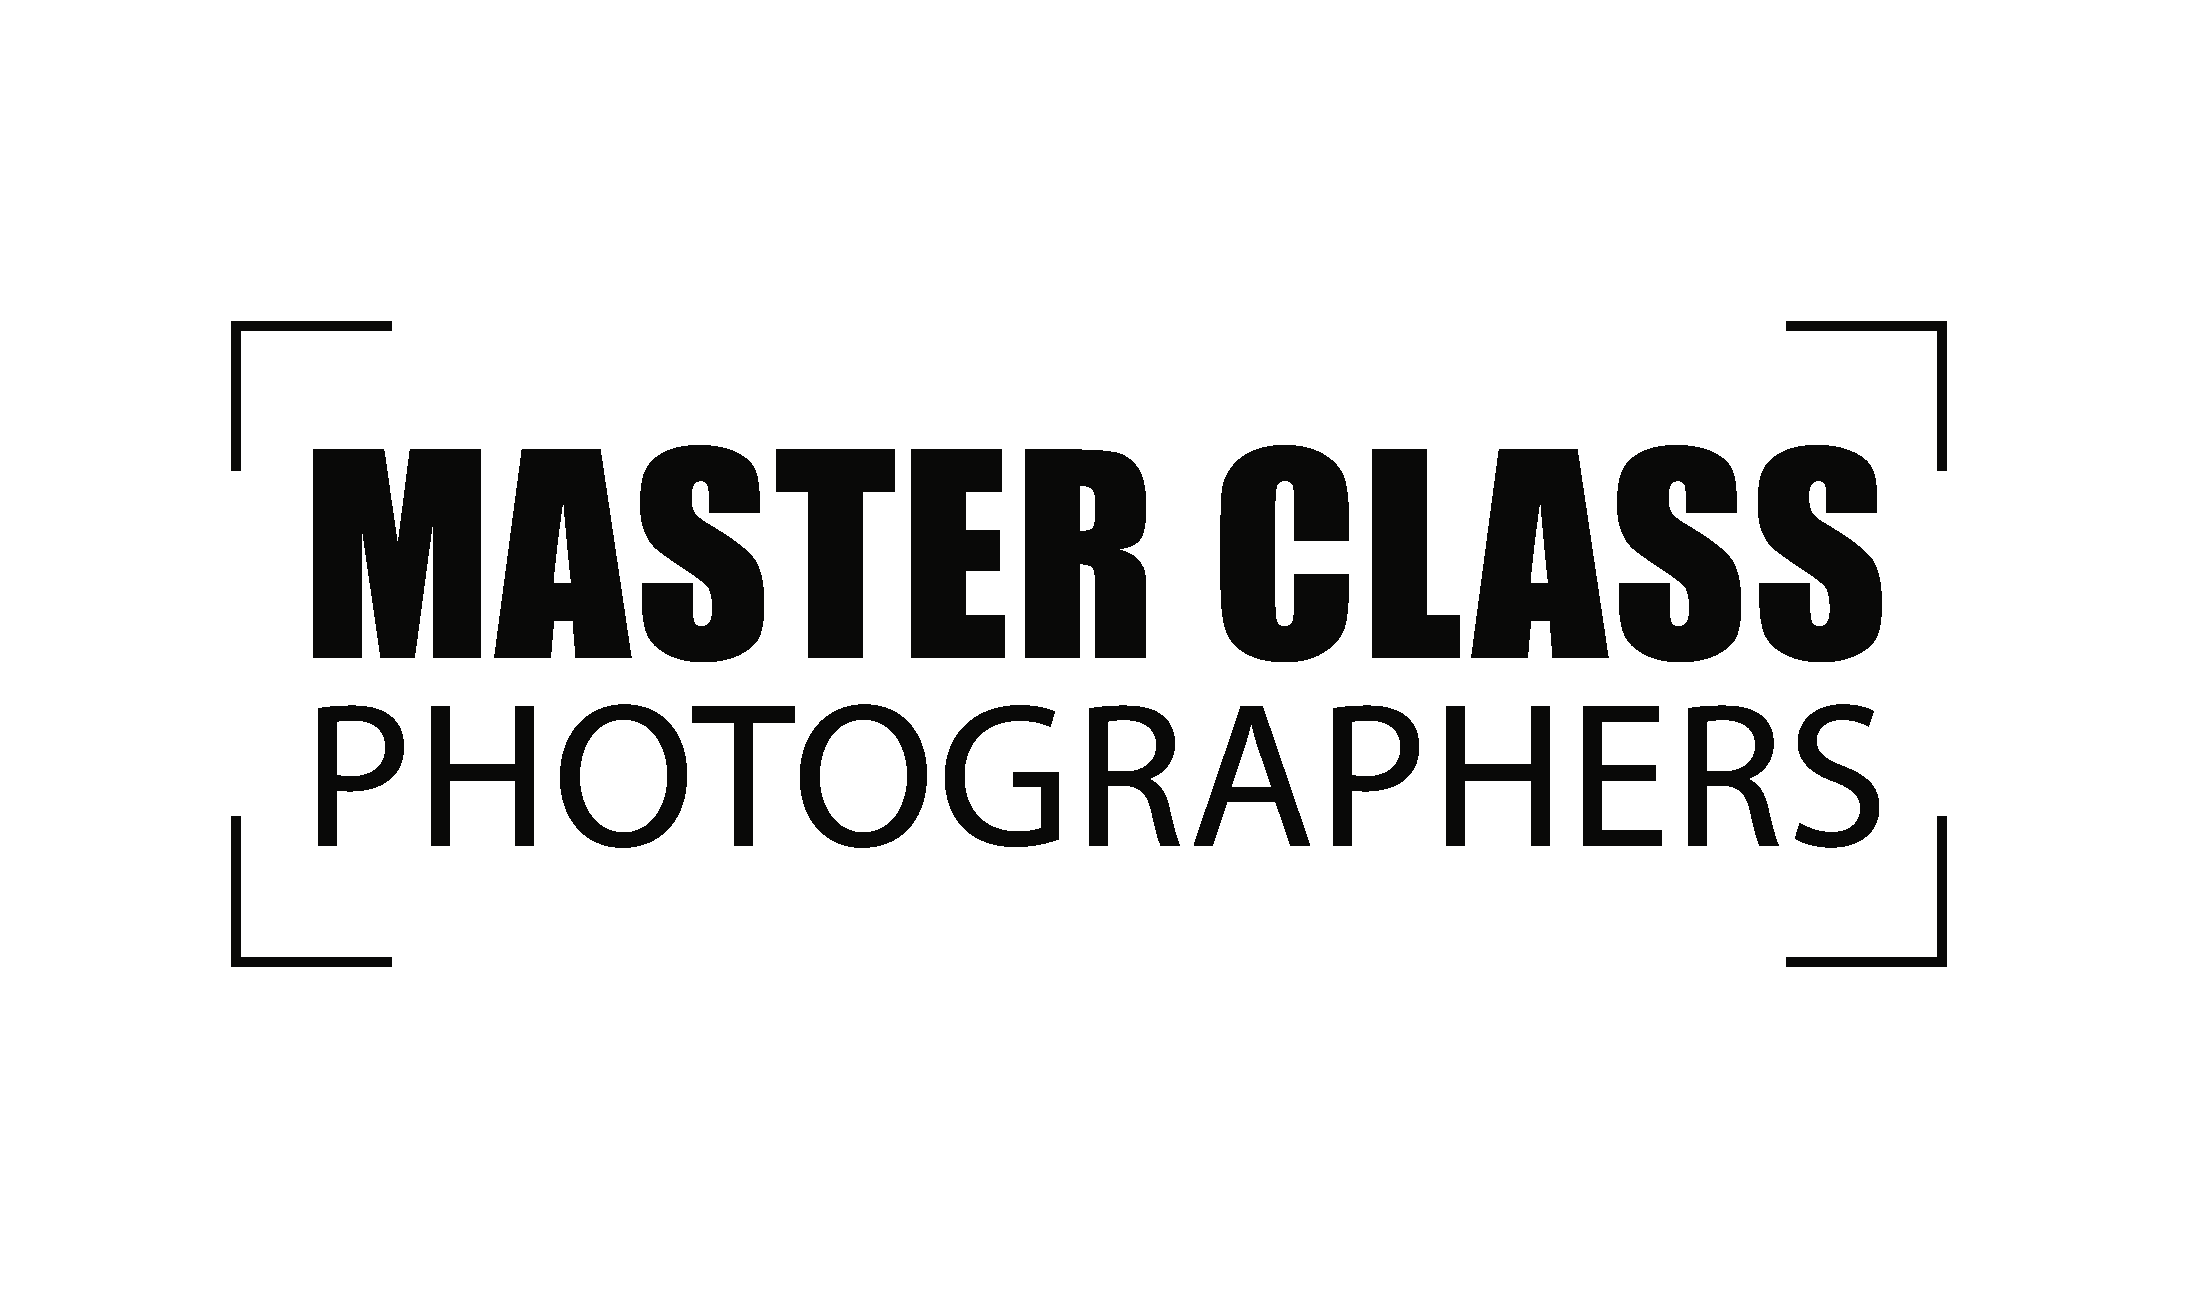 Cursos online de fotografía | Masterclass Photographers